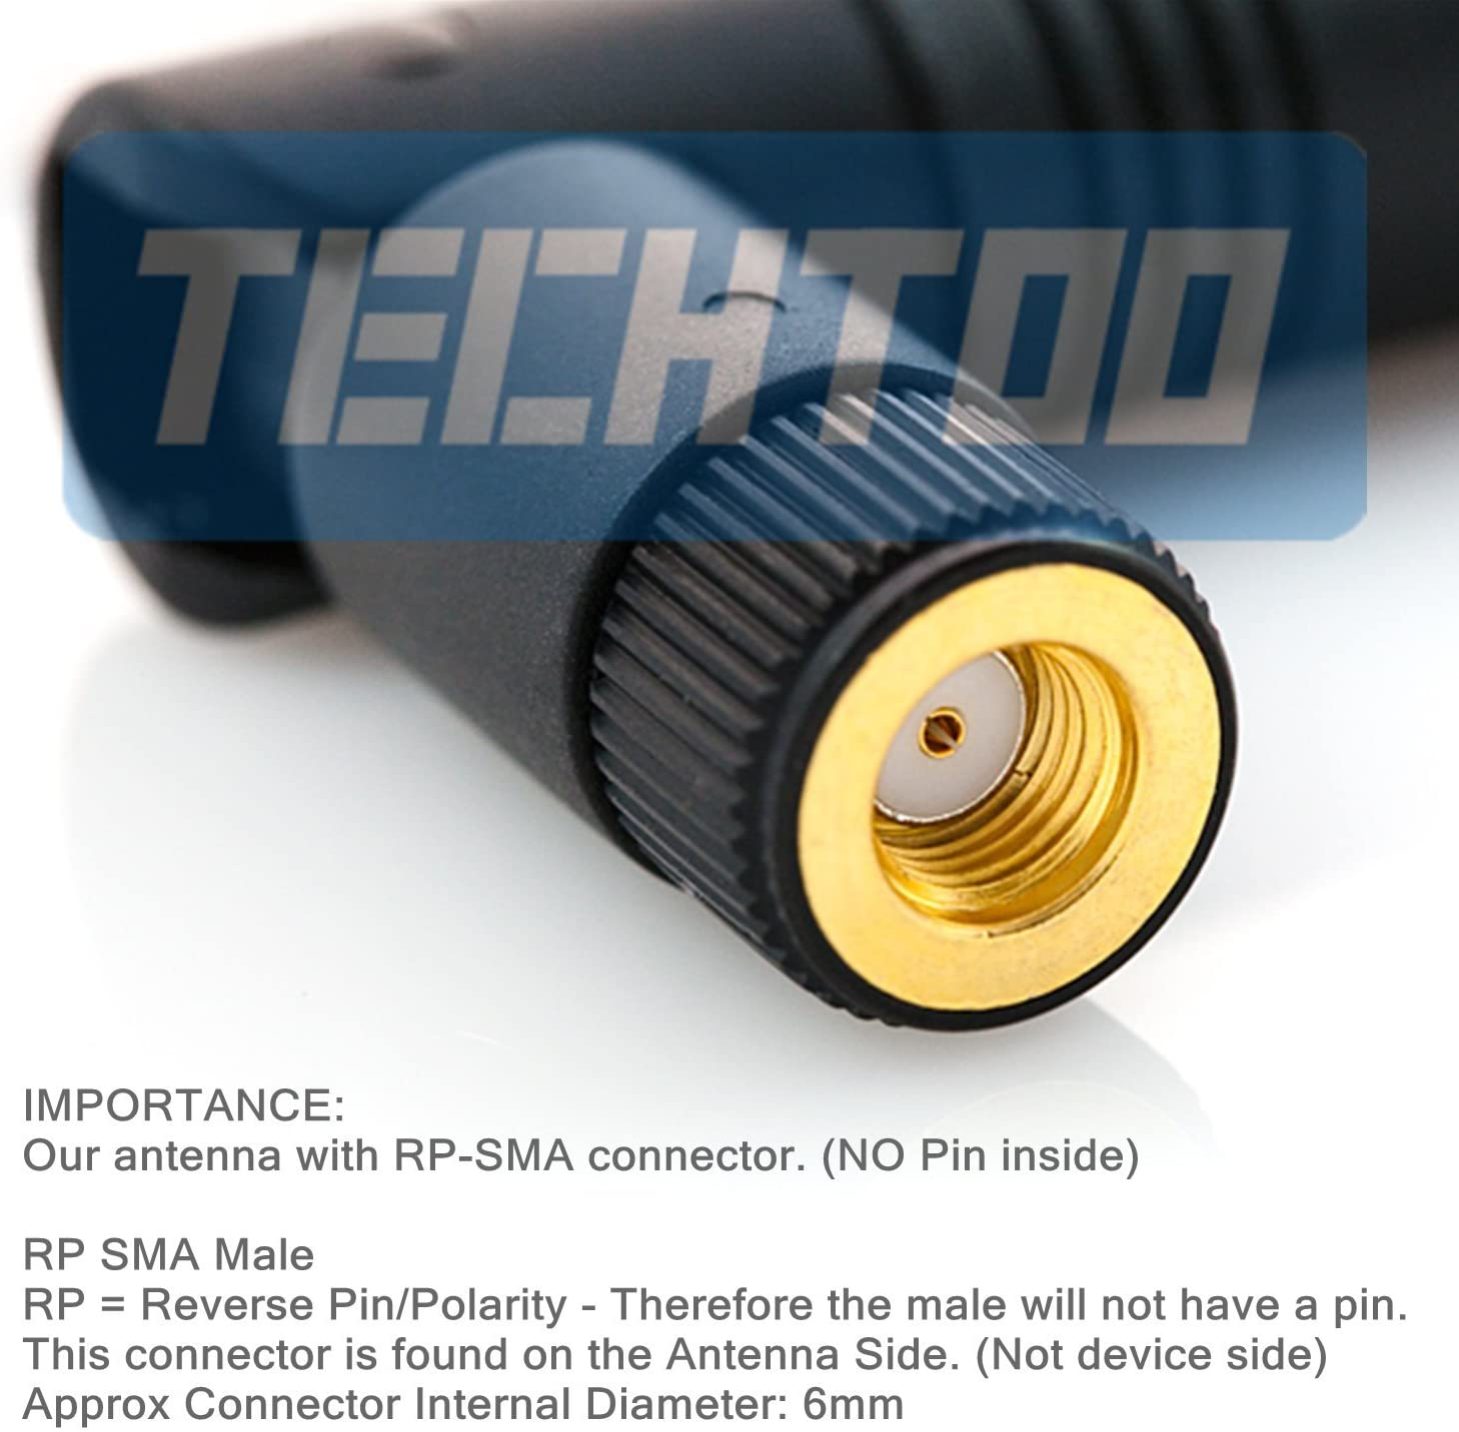 Antenna 2.4G 2.4GHZ 5dBi SMA male plug pin Omni WiFi Wireless Booster Paddle